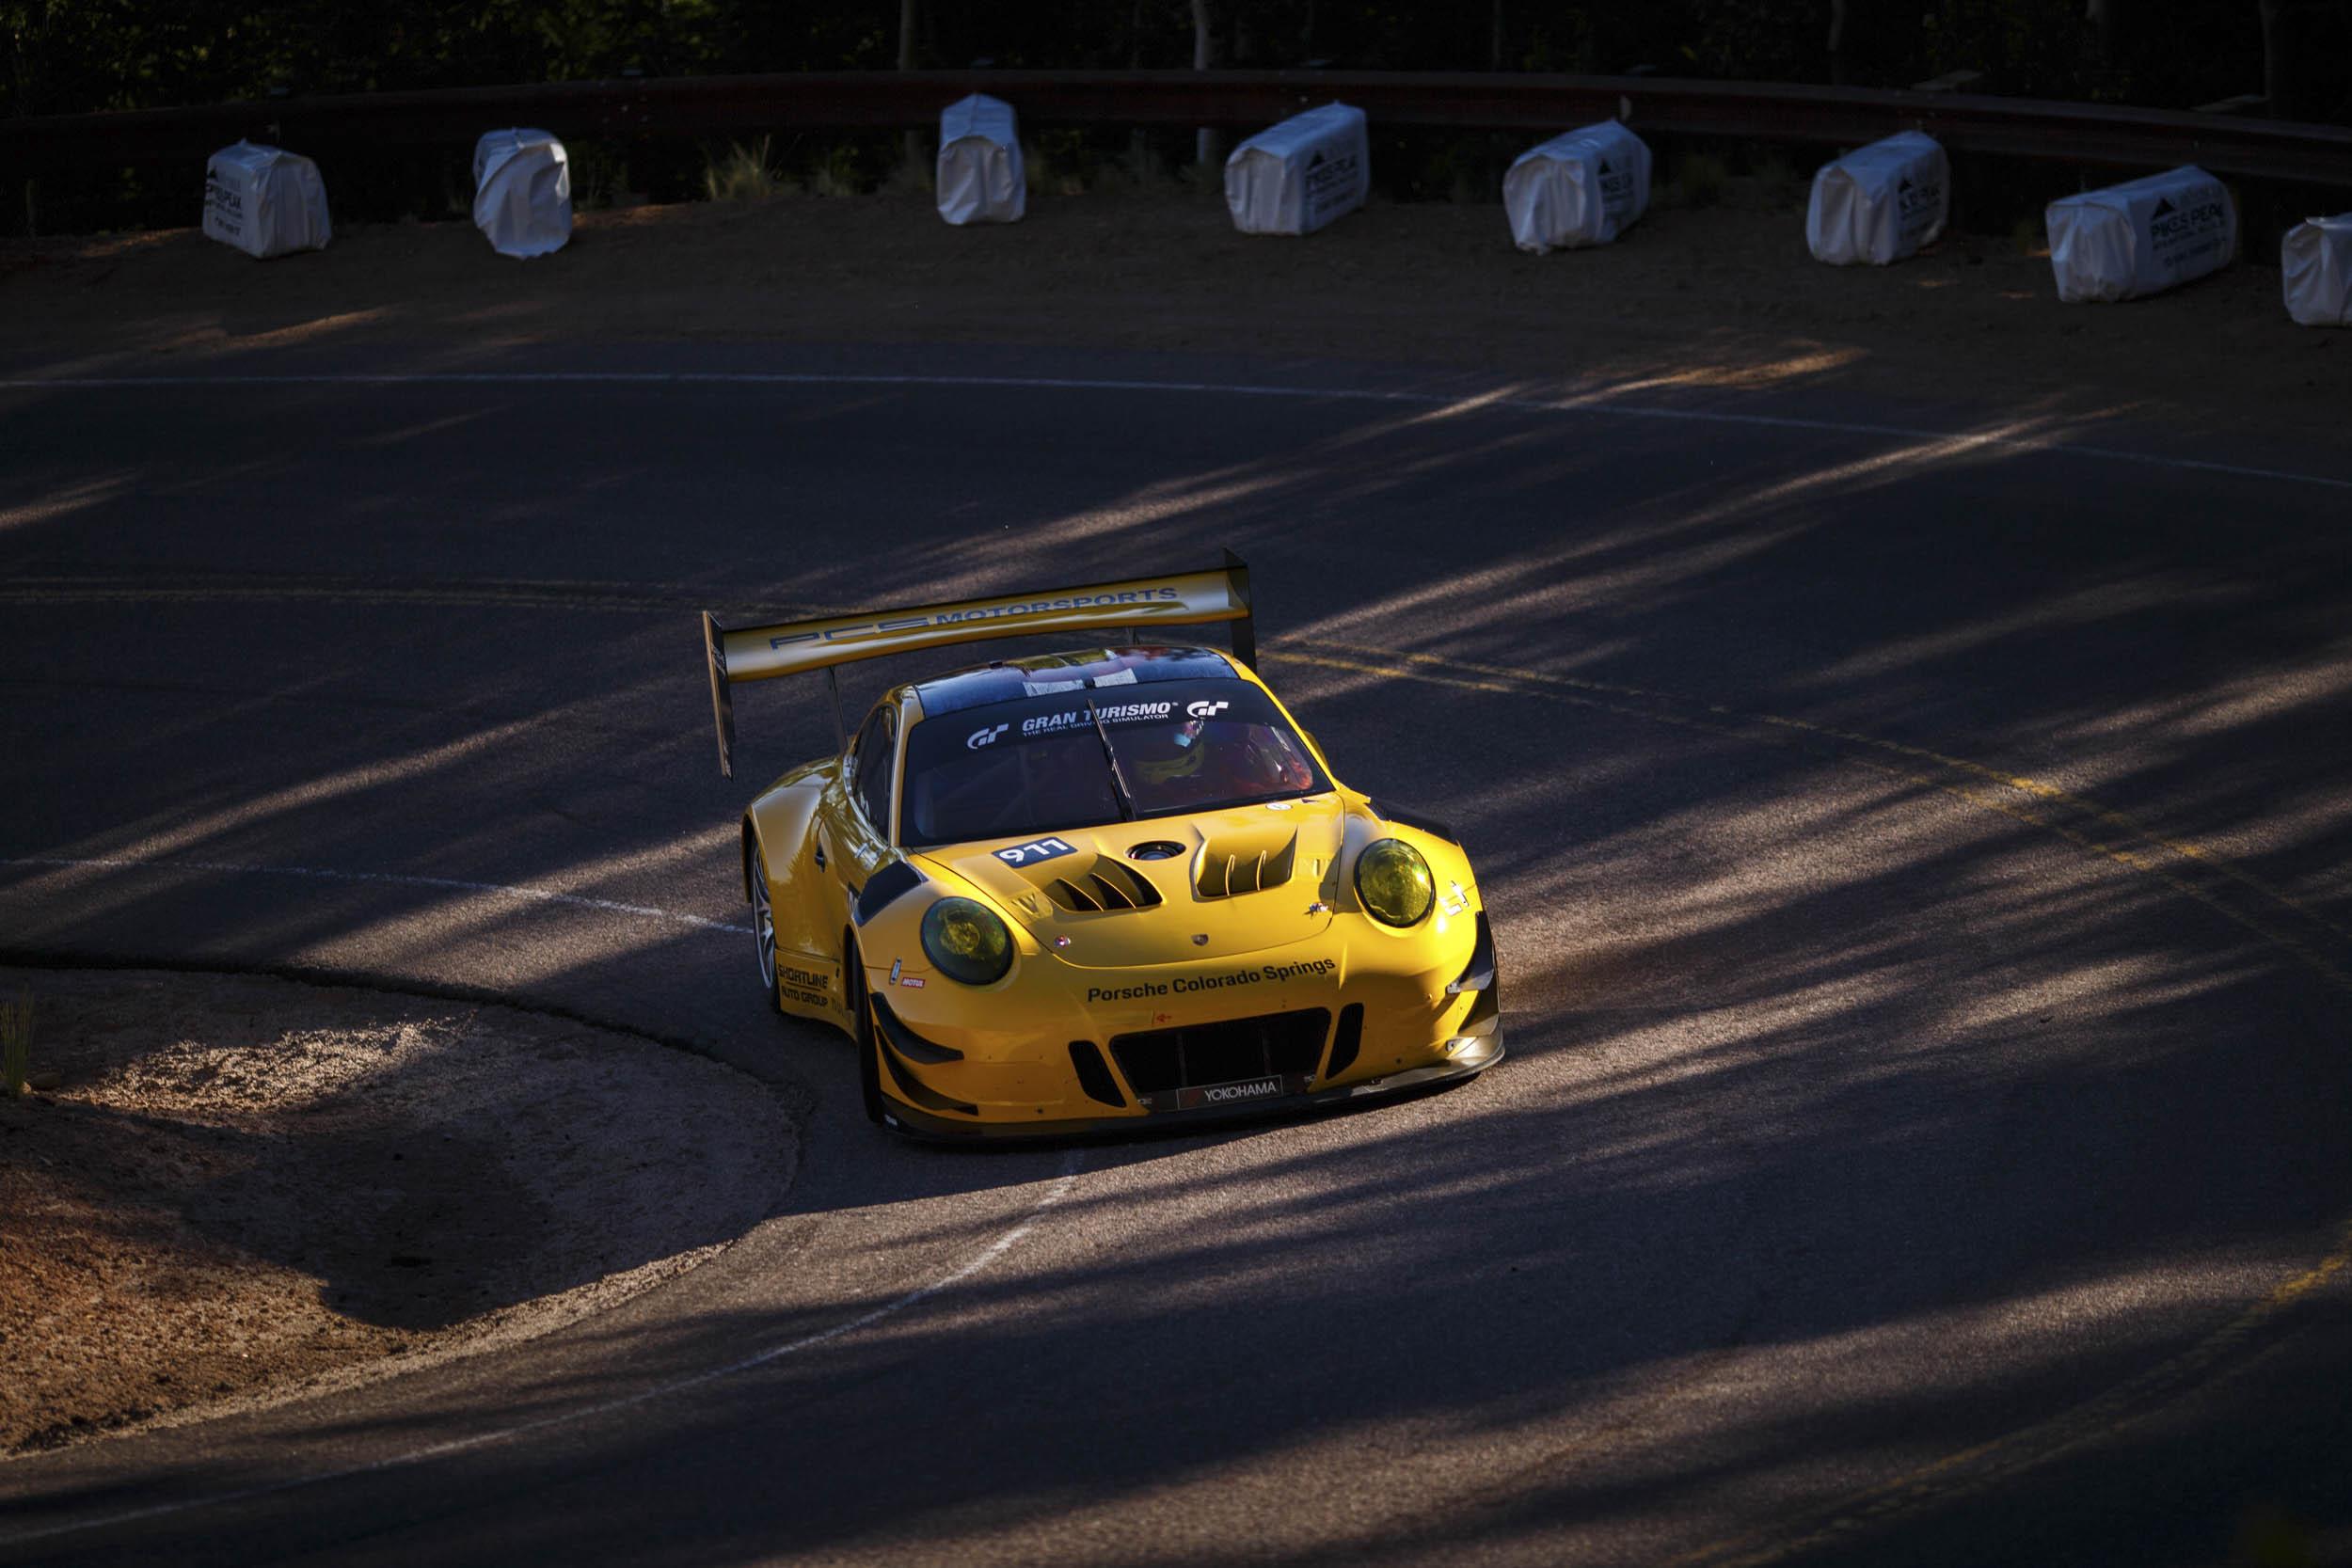 Porsche climbing Pikes Peak 2018